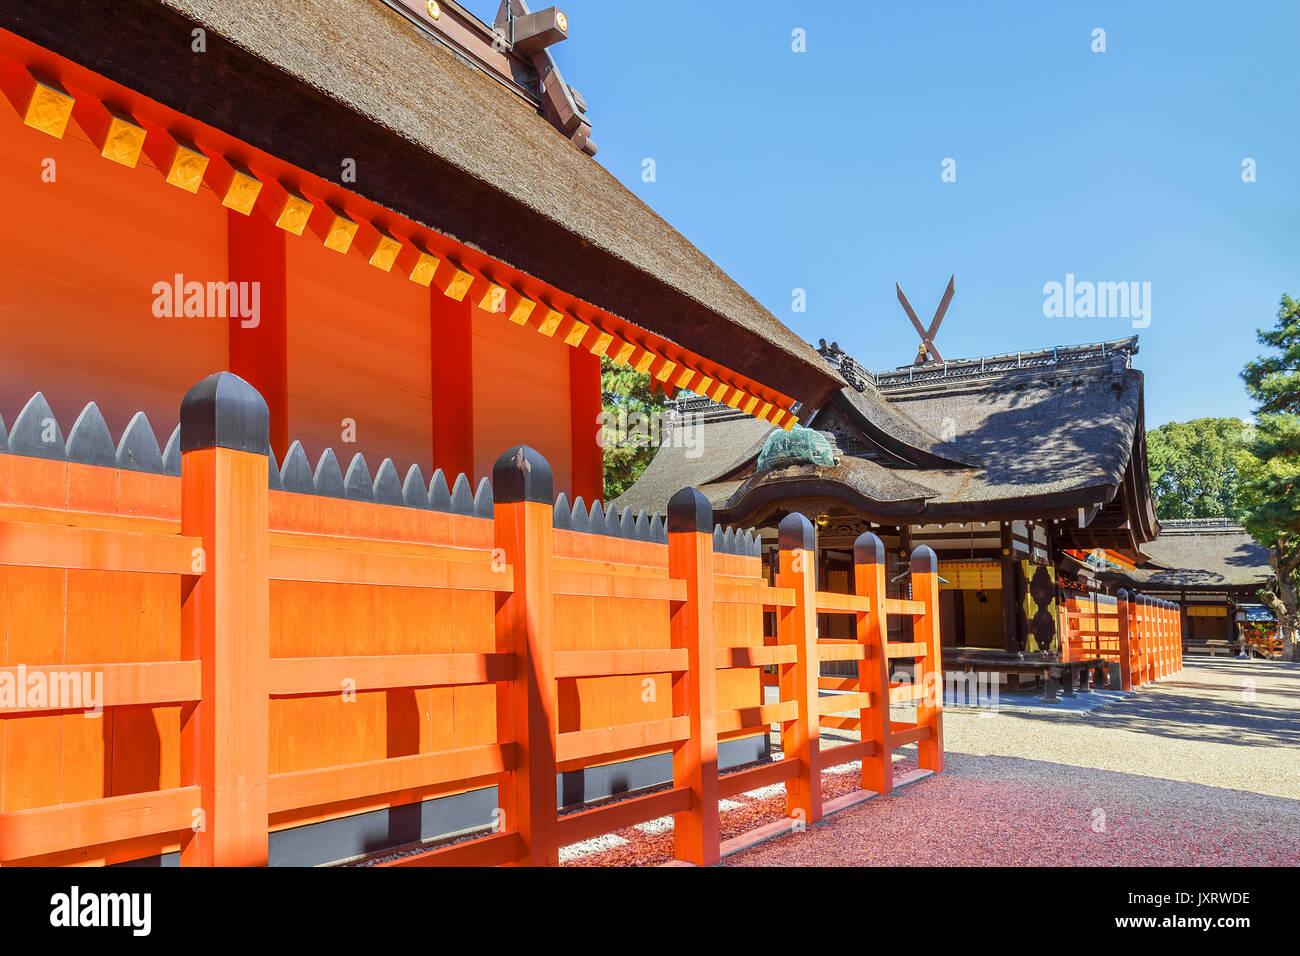 Sumiyoshi Grand Shrine (Sumiyoshi-taisha) in Osaka - Stock Image